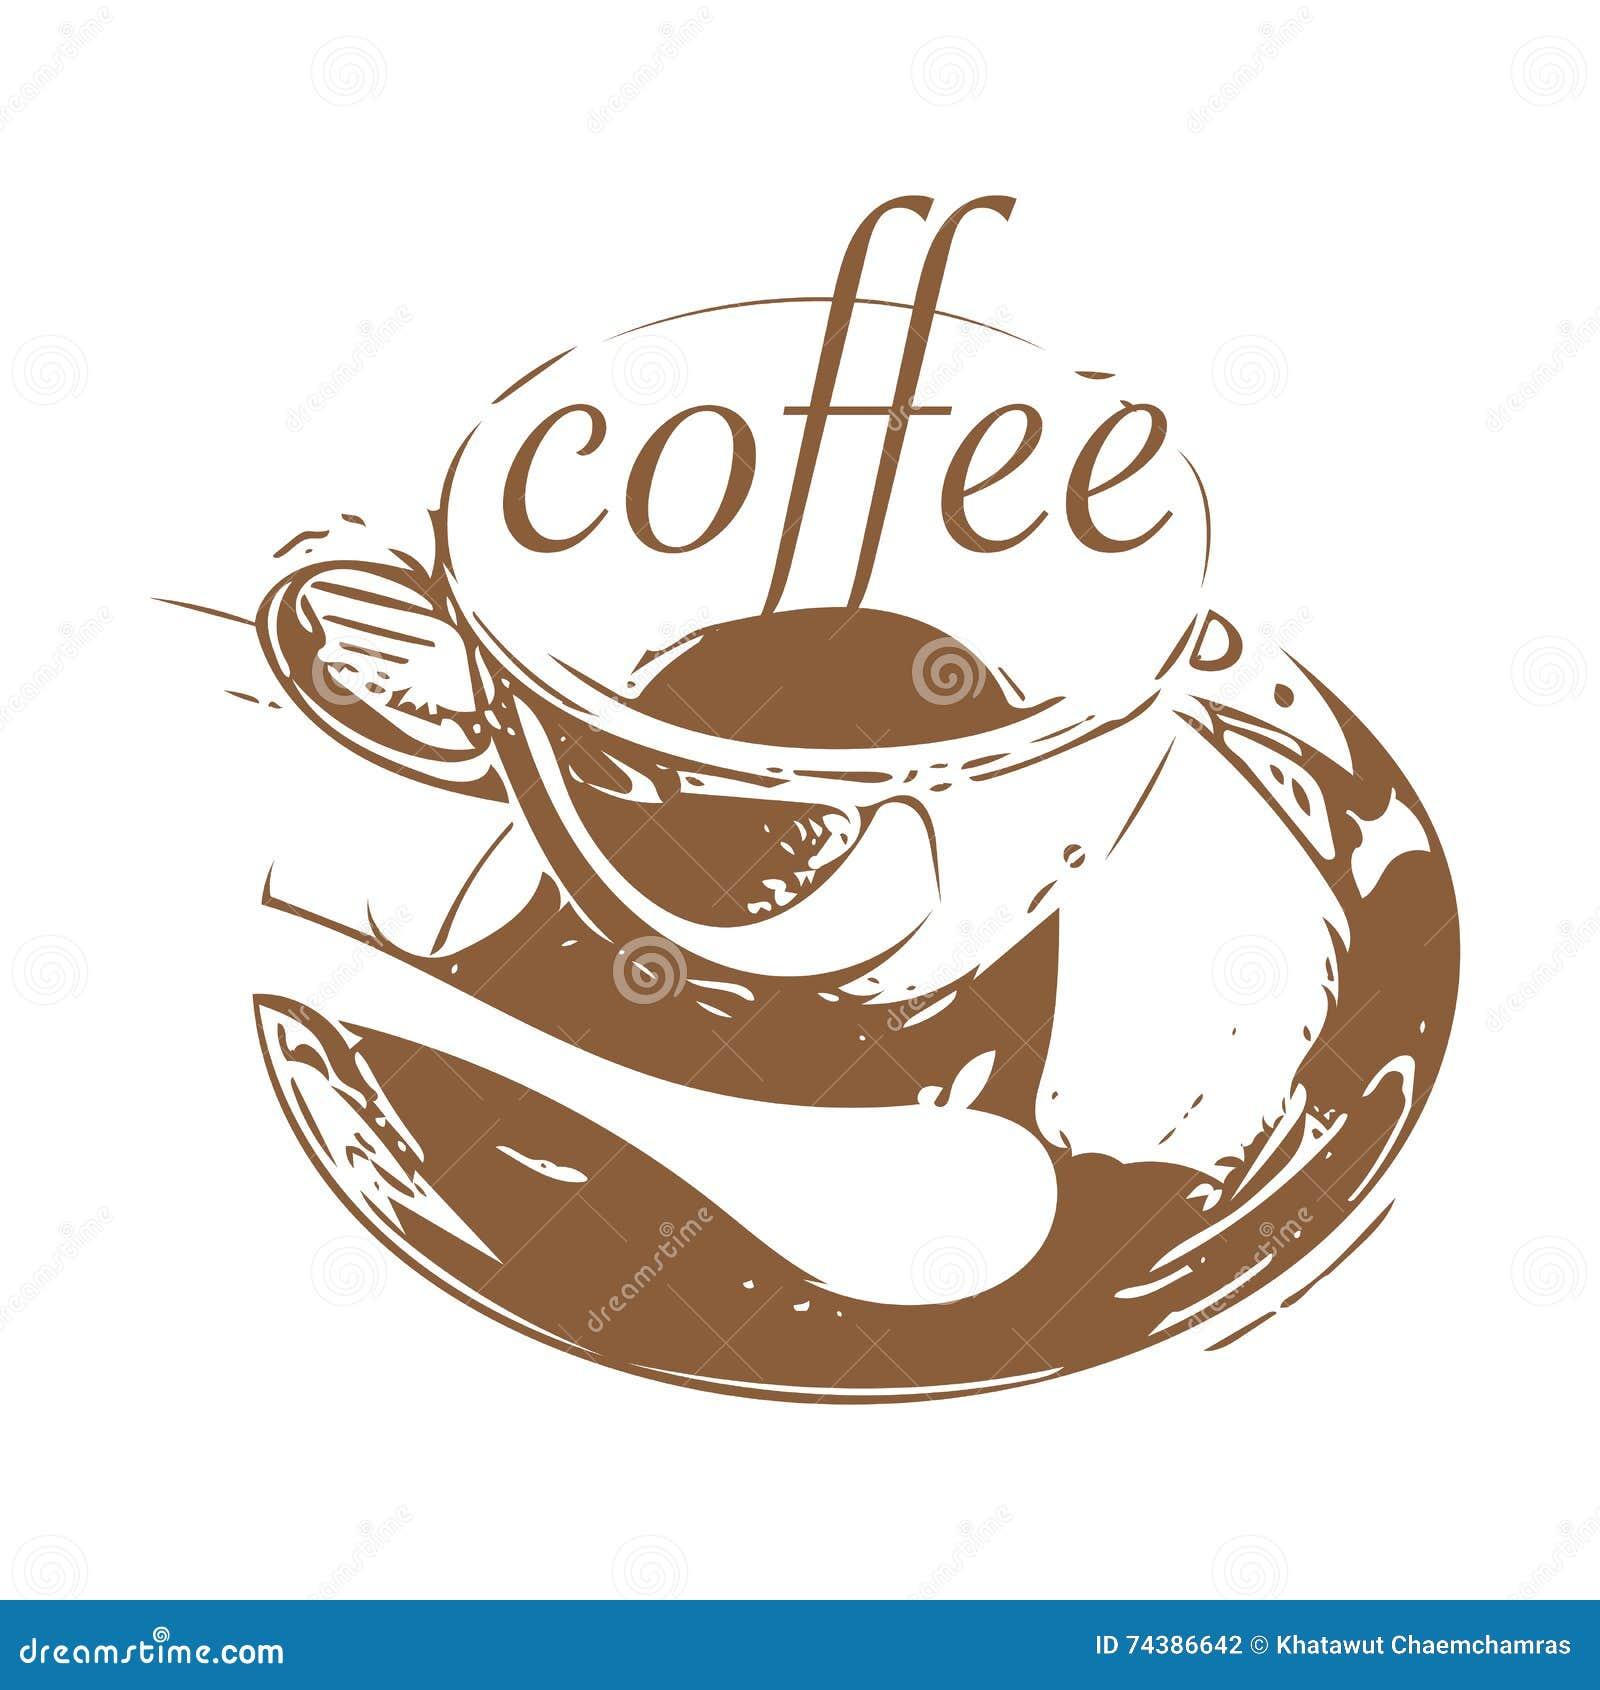 Coffee Shop Logo Design Stock Vector Illustration Of Drink 74386642